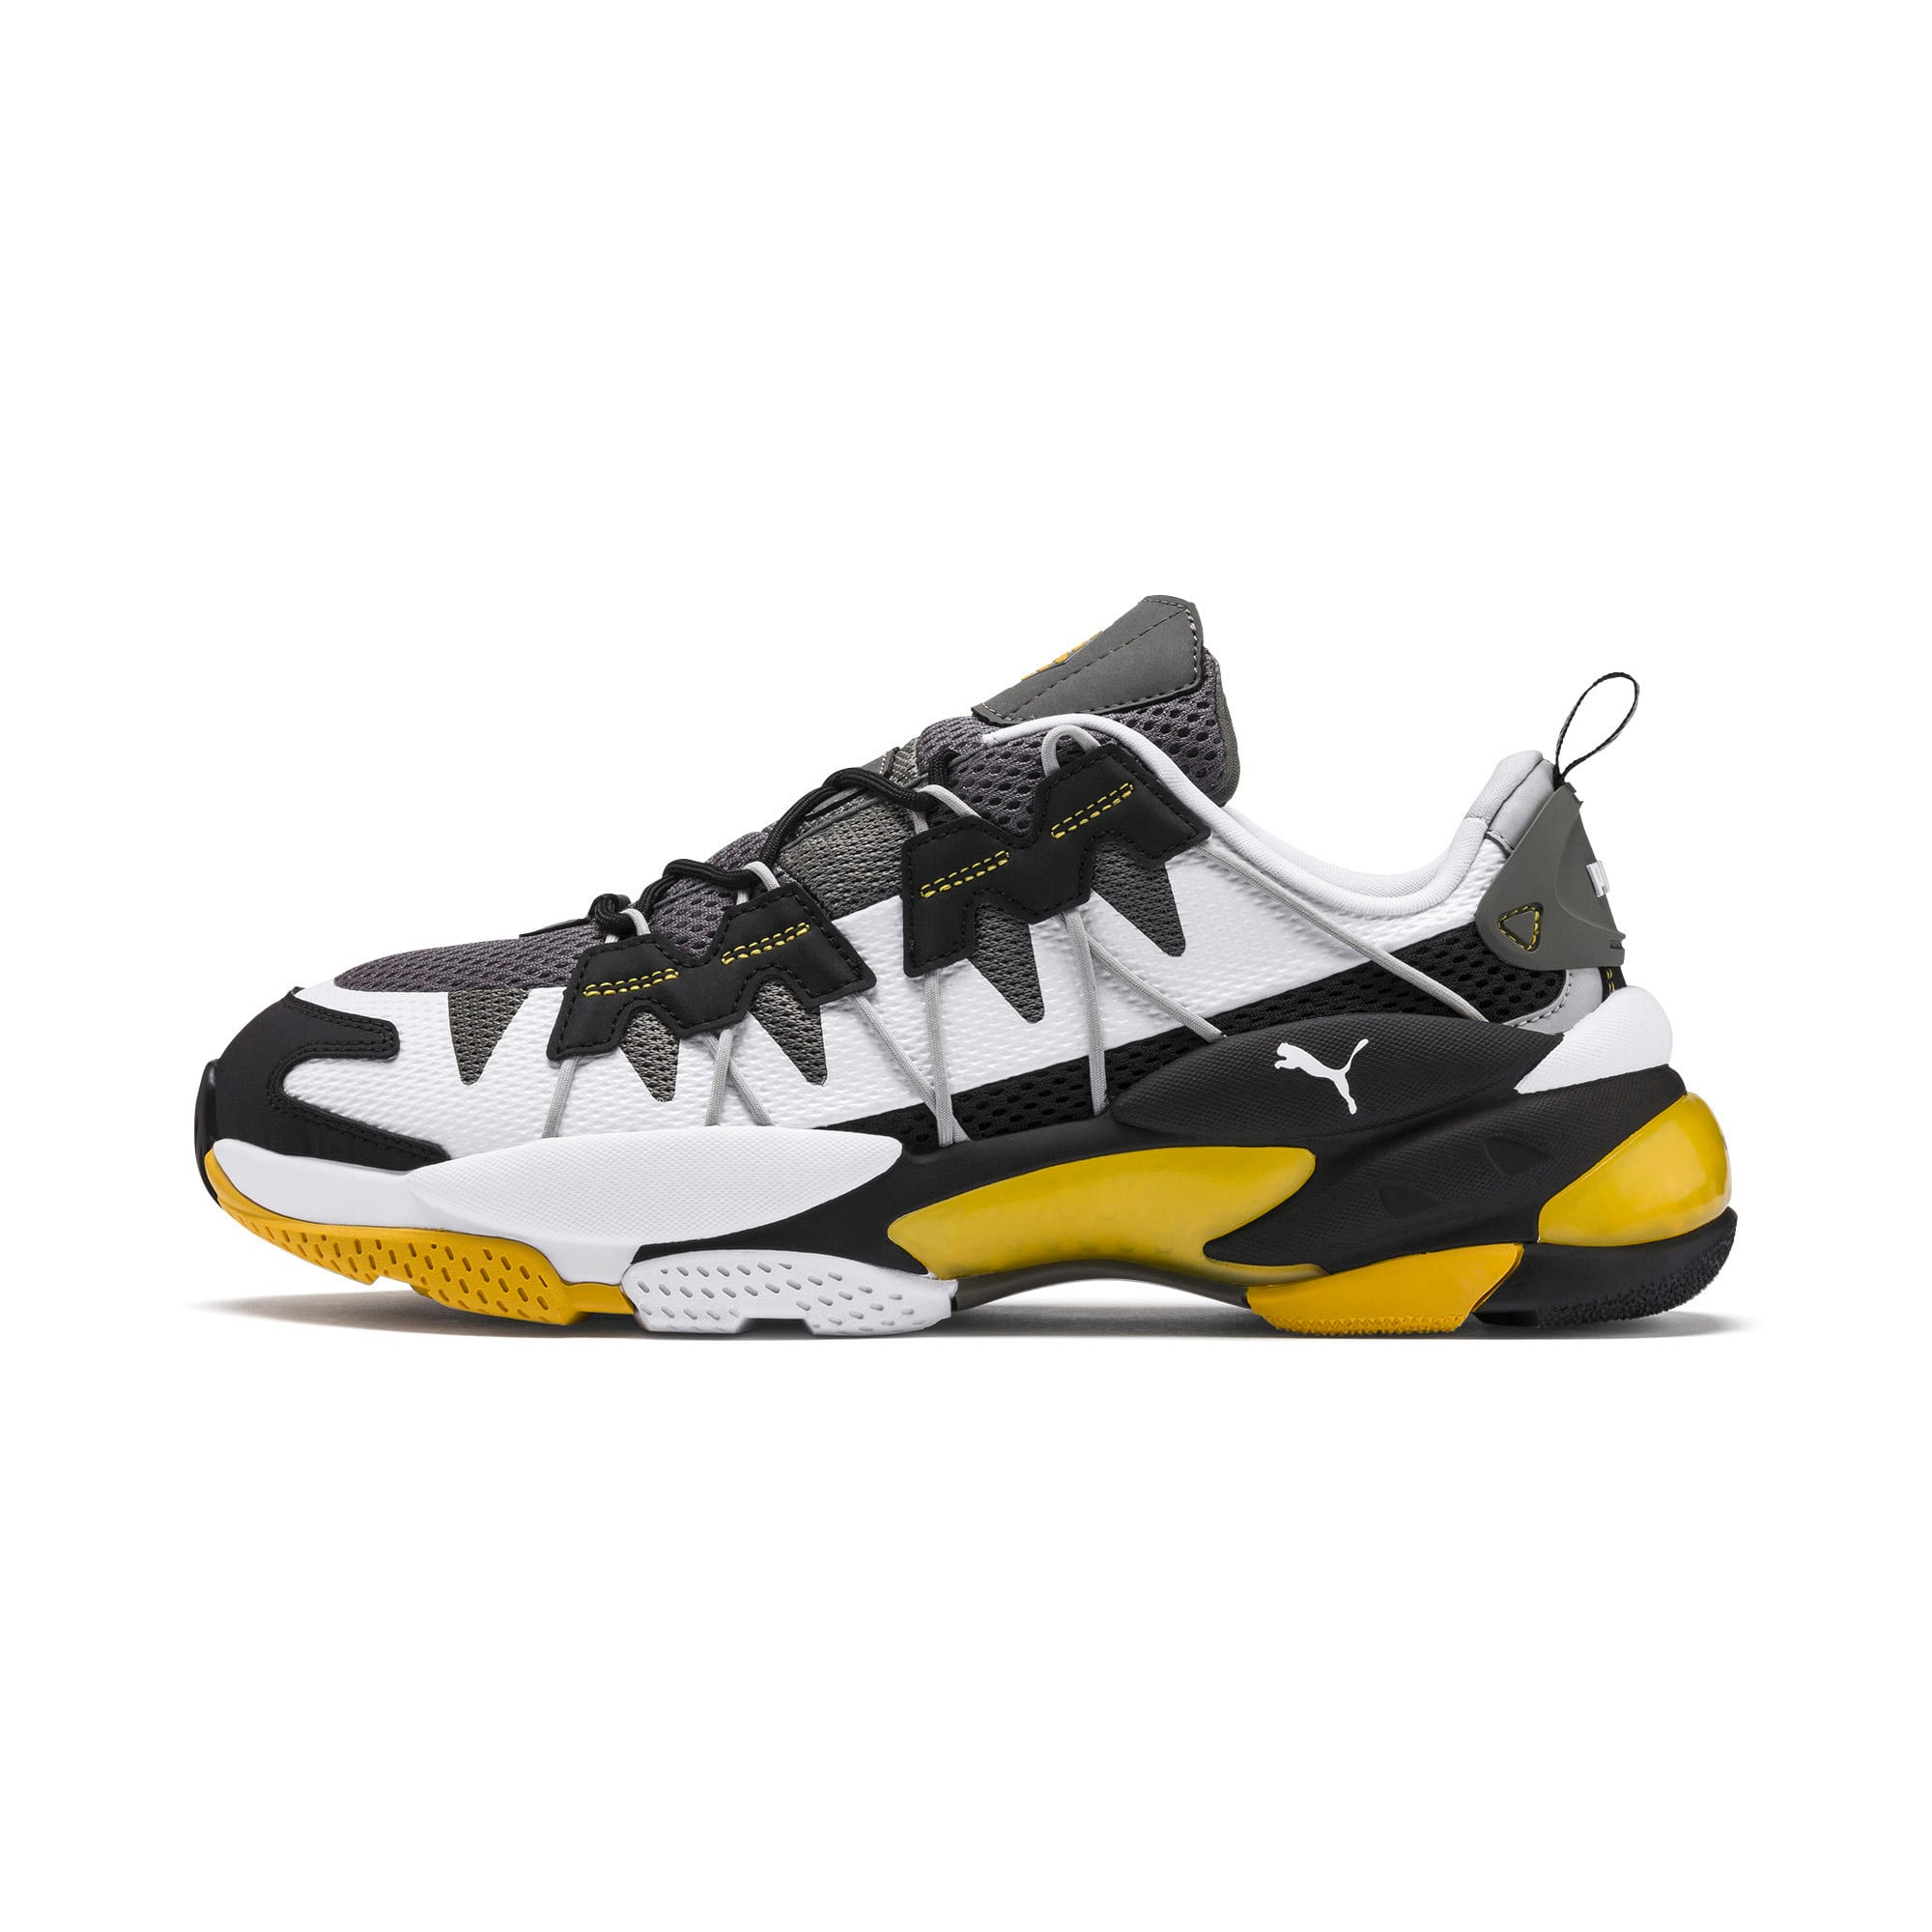 Thumbnail 1 of LQDCELL Omega Training Shoes, Puma Black-CASTLEROCK, medium